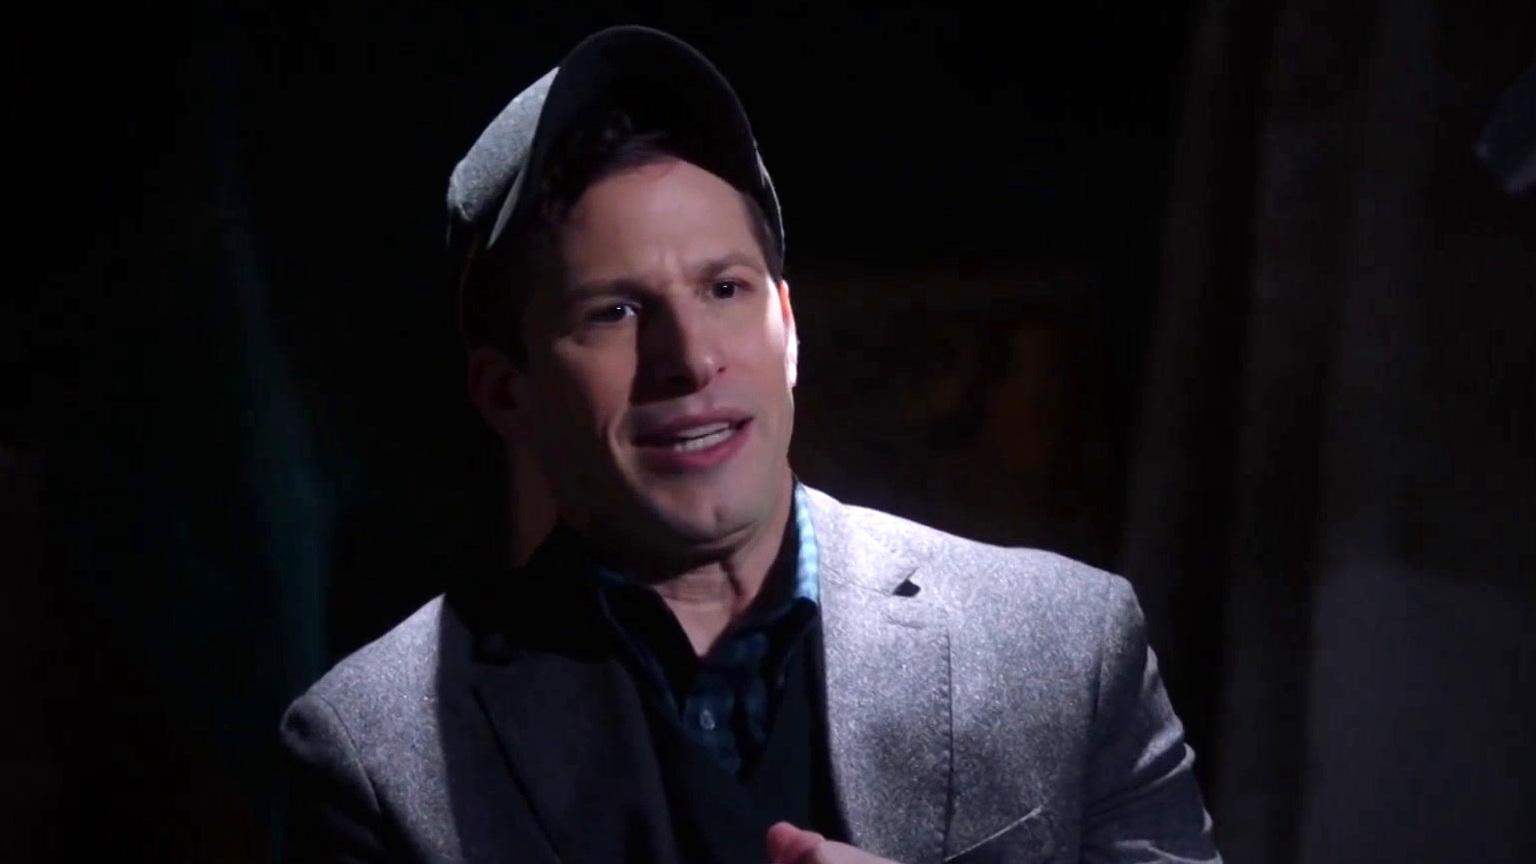 Brooklyn Nine-Nine: Holt Gets Vengeance For His Fluffy Boy